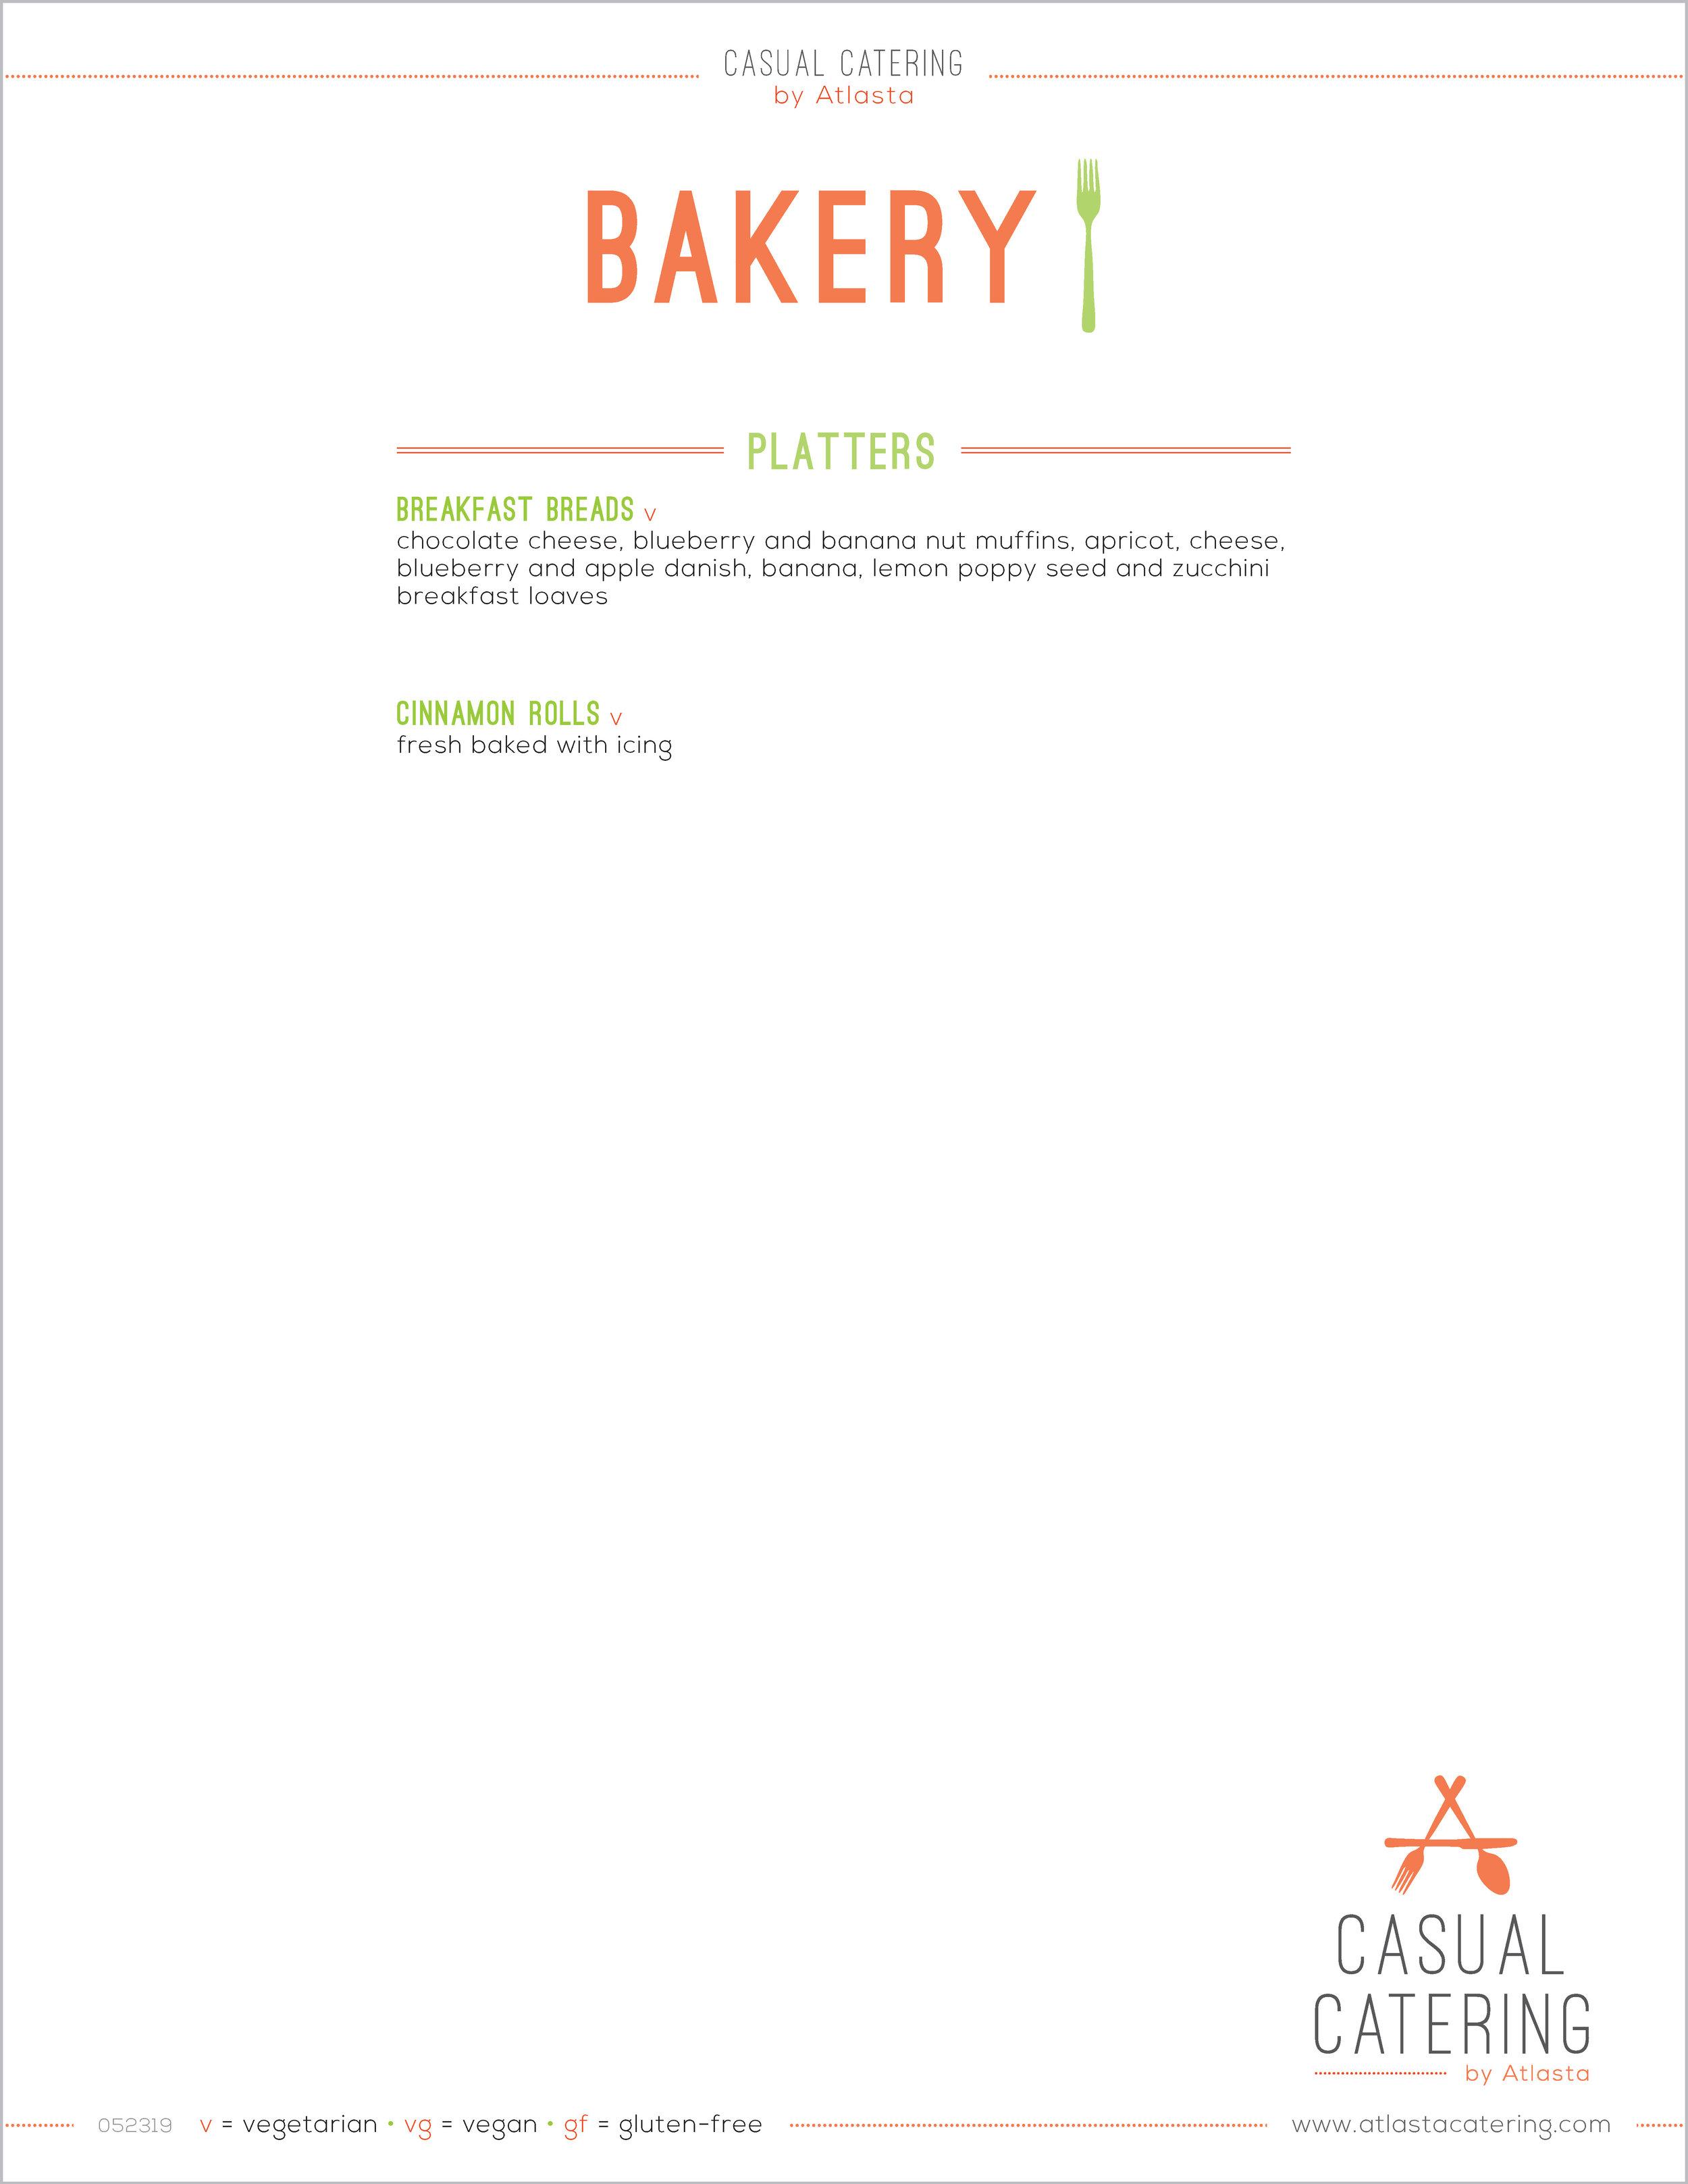 04 Casual Catering - Bakery V4.jpg